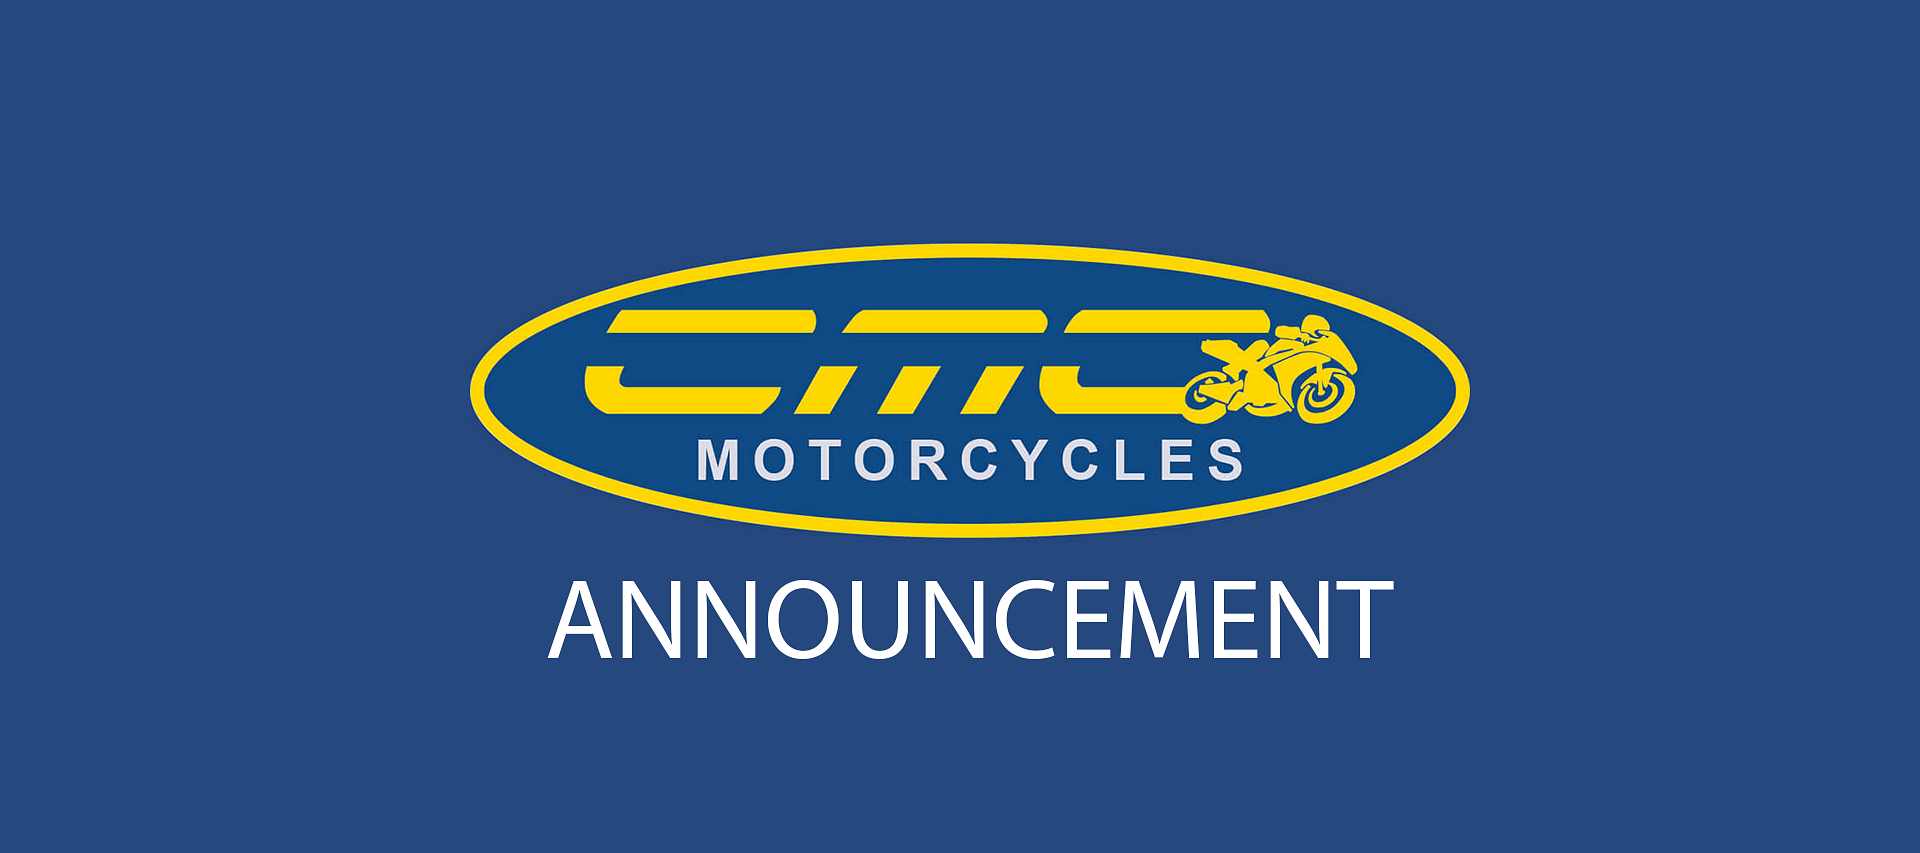 CMC Announcement